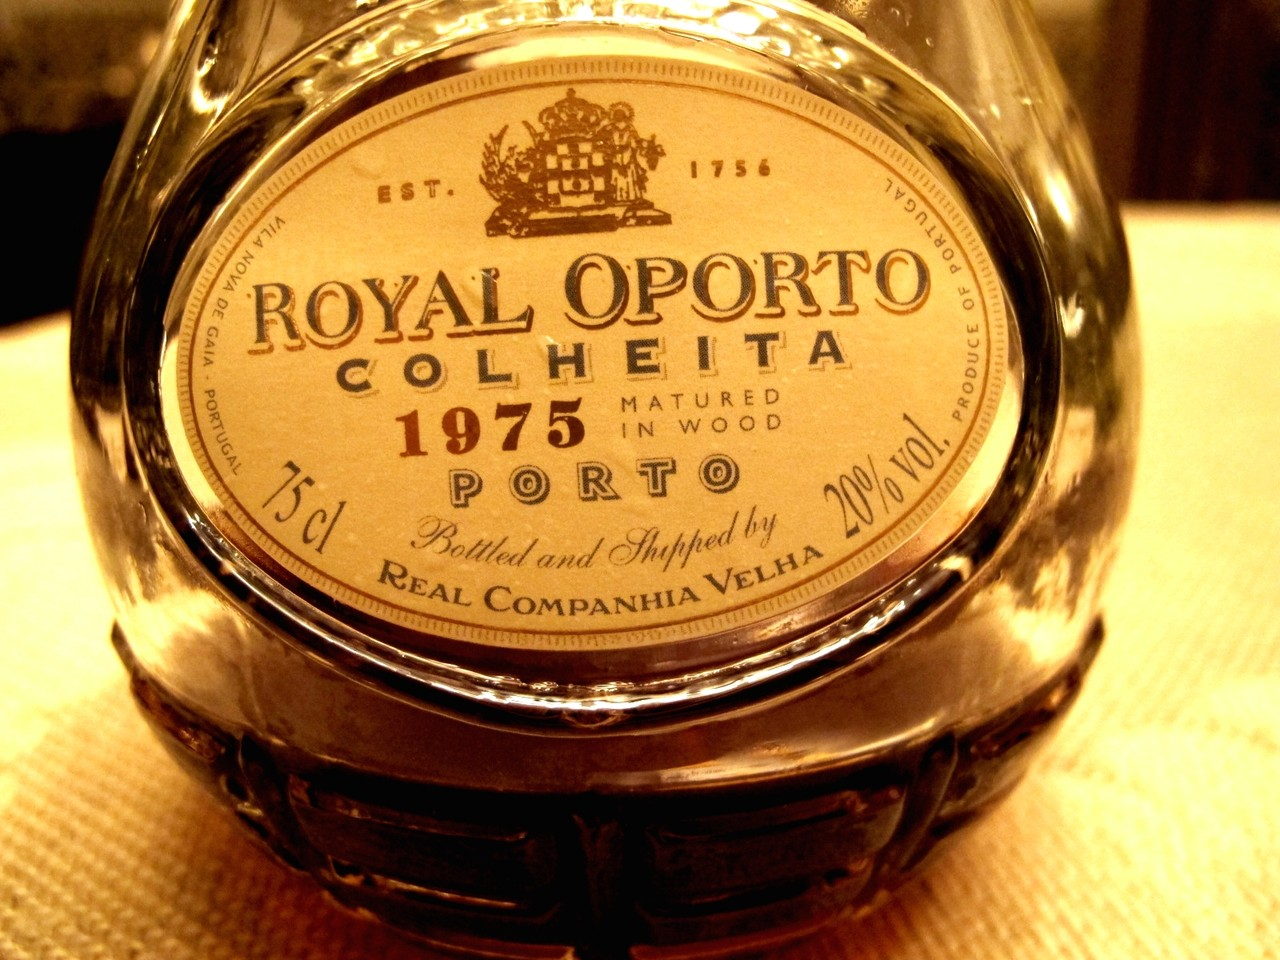 Royal Oporto 1975